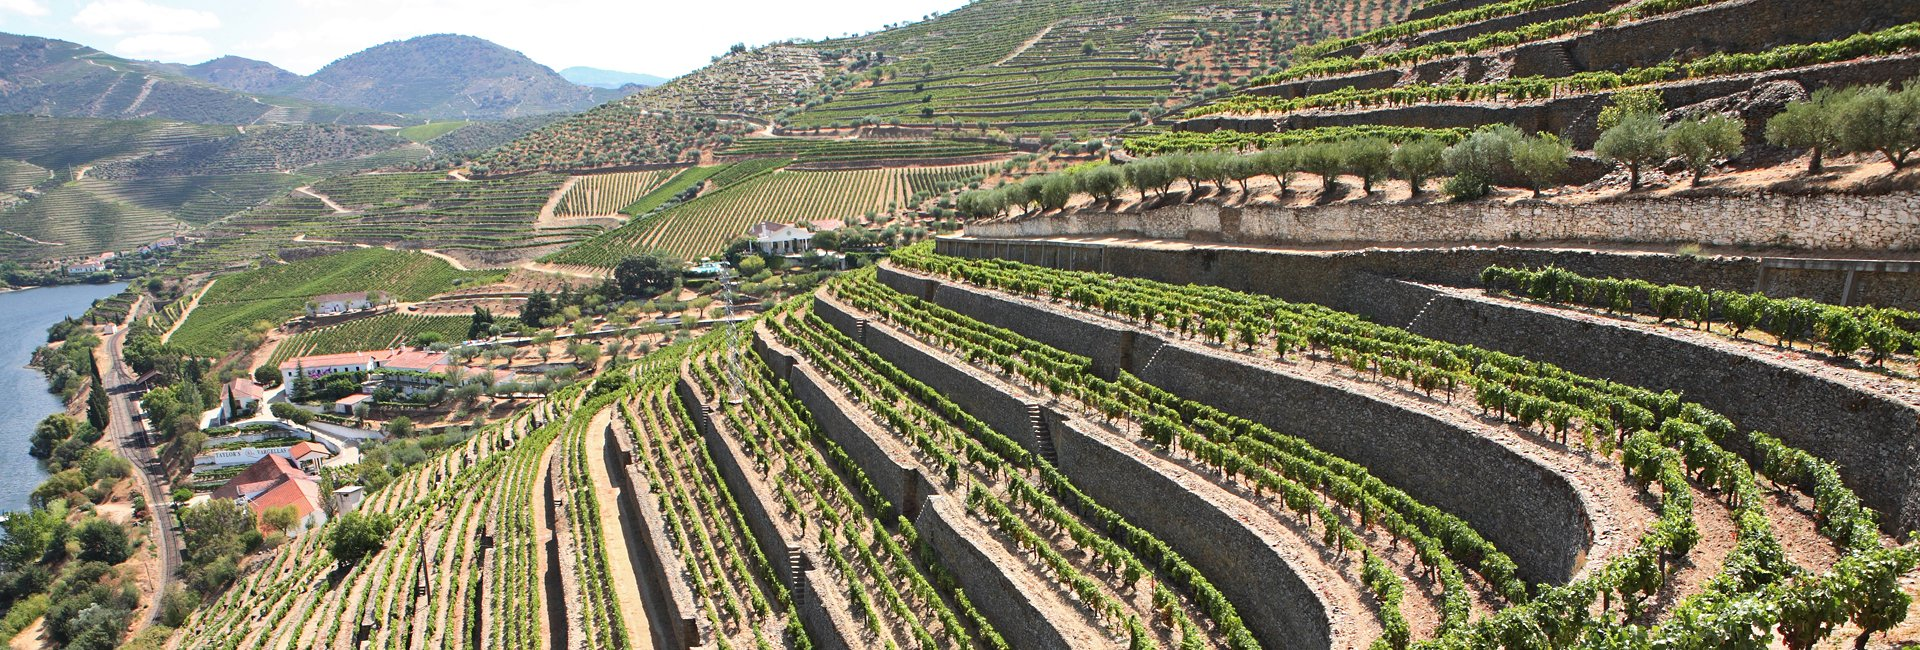 70 Viticultores Associados